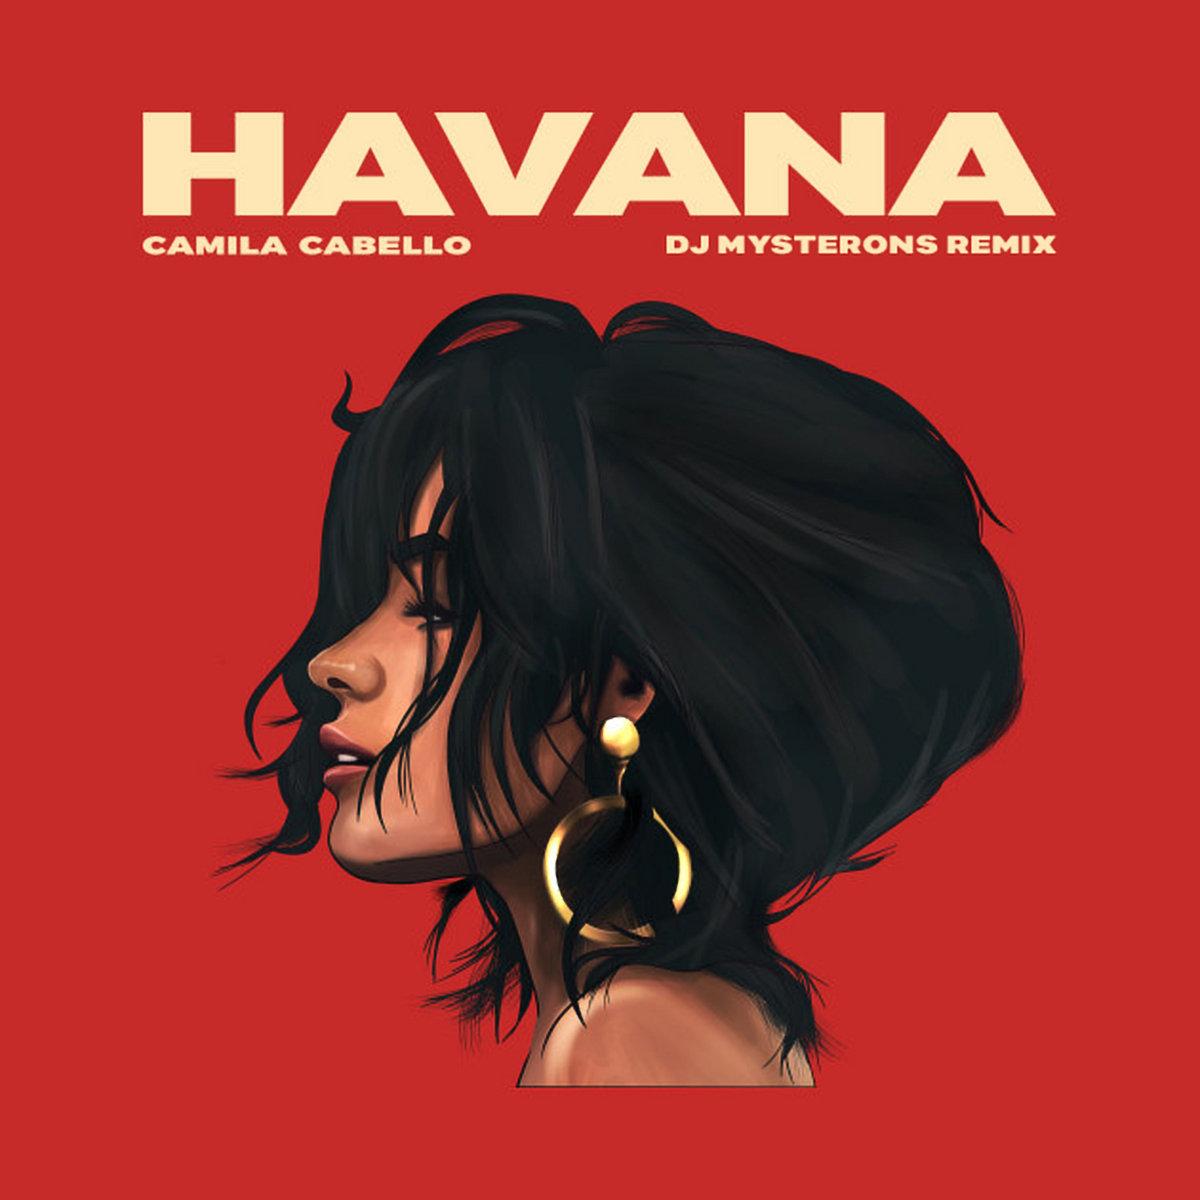 havana camila free mp3 download